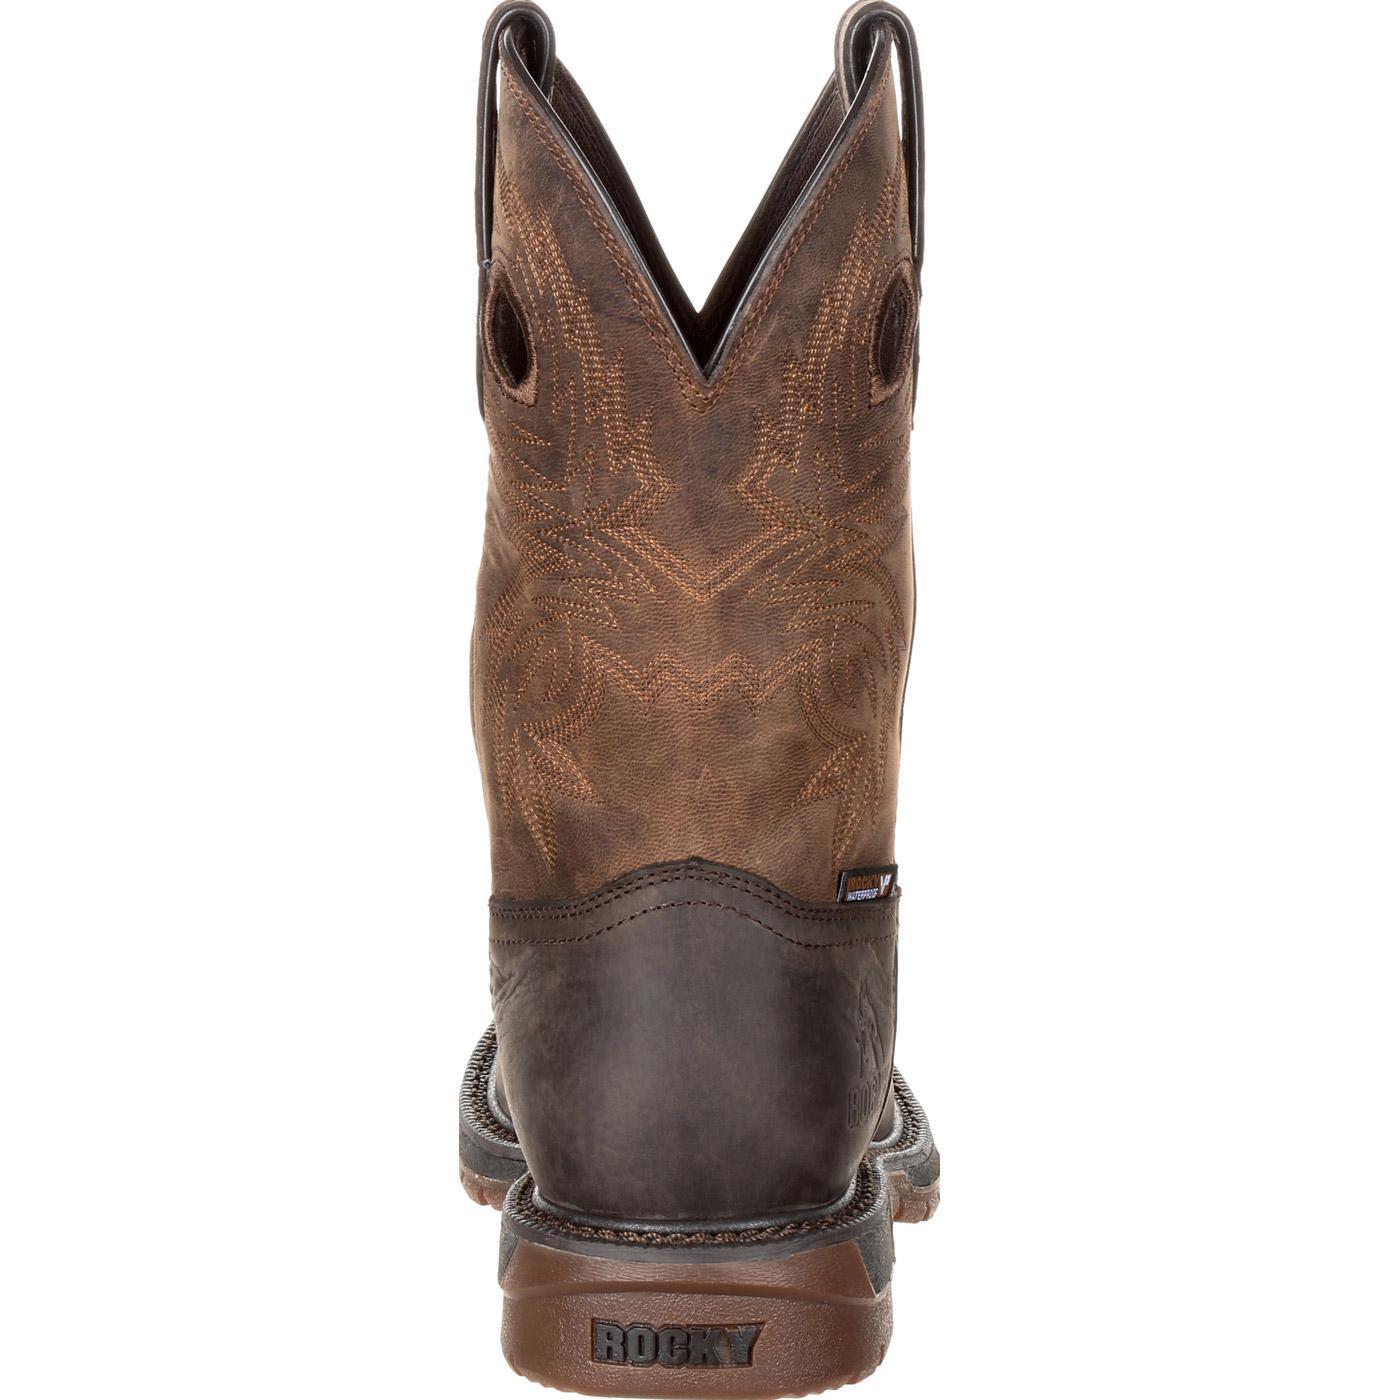 9c764695223 Rocky Original Ride FLX Waterproof Western Boot